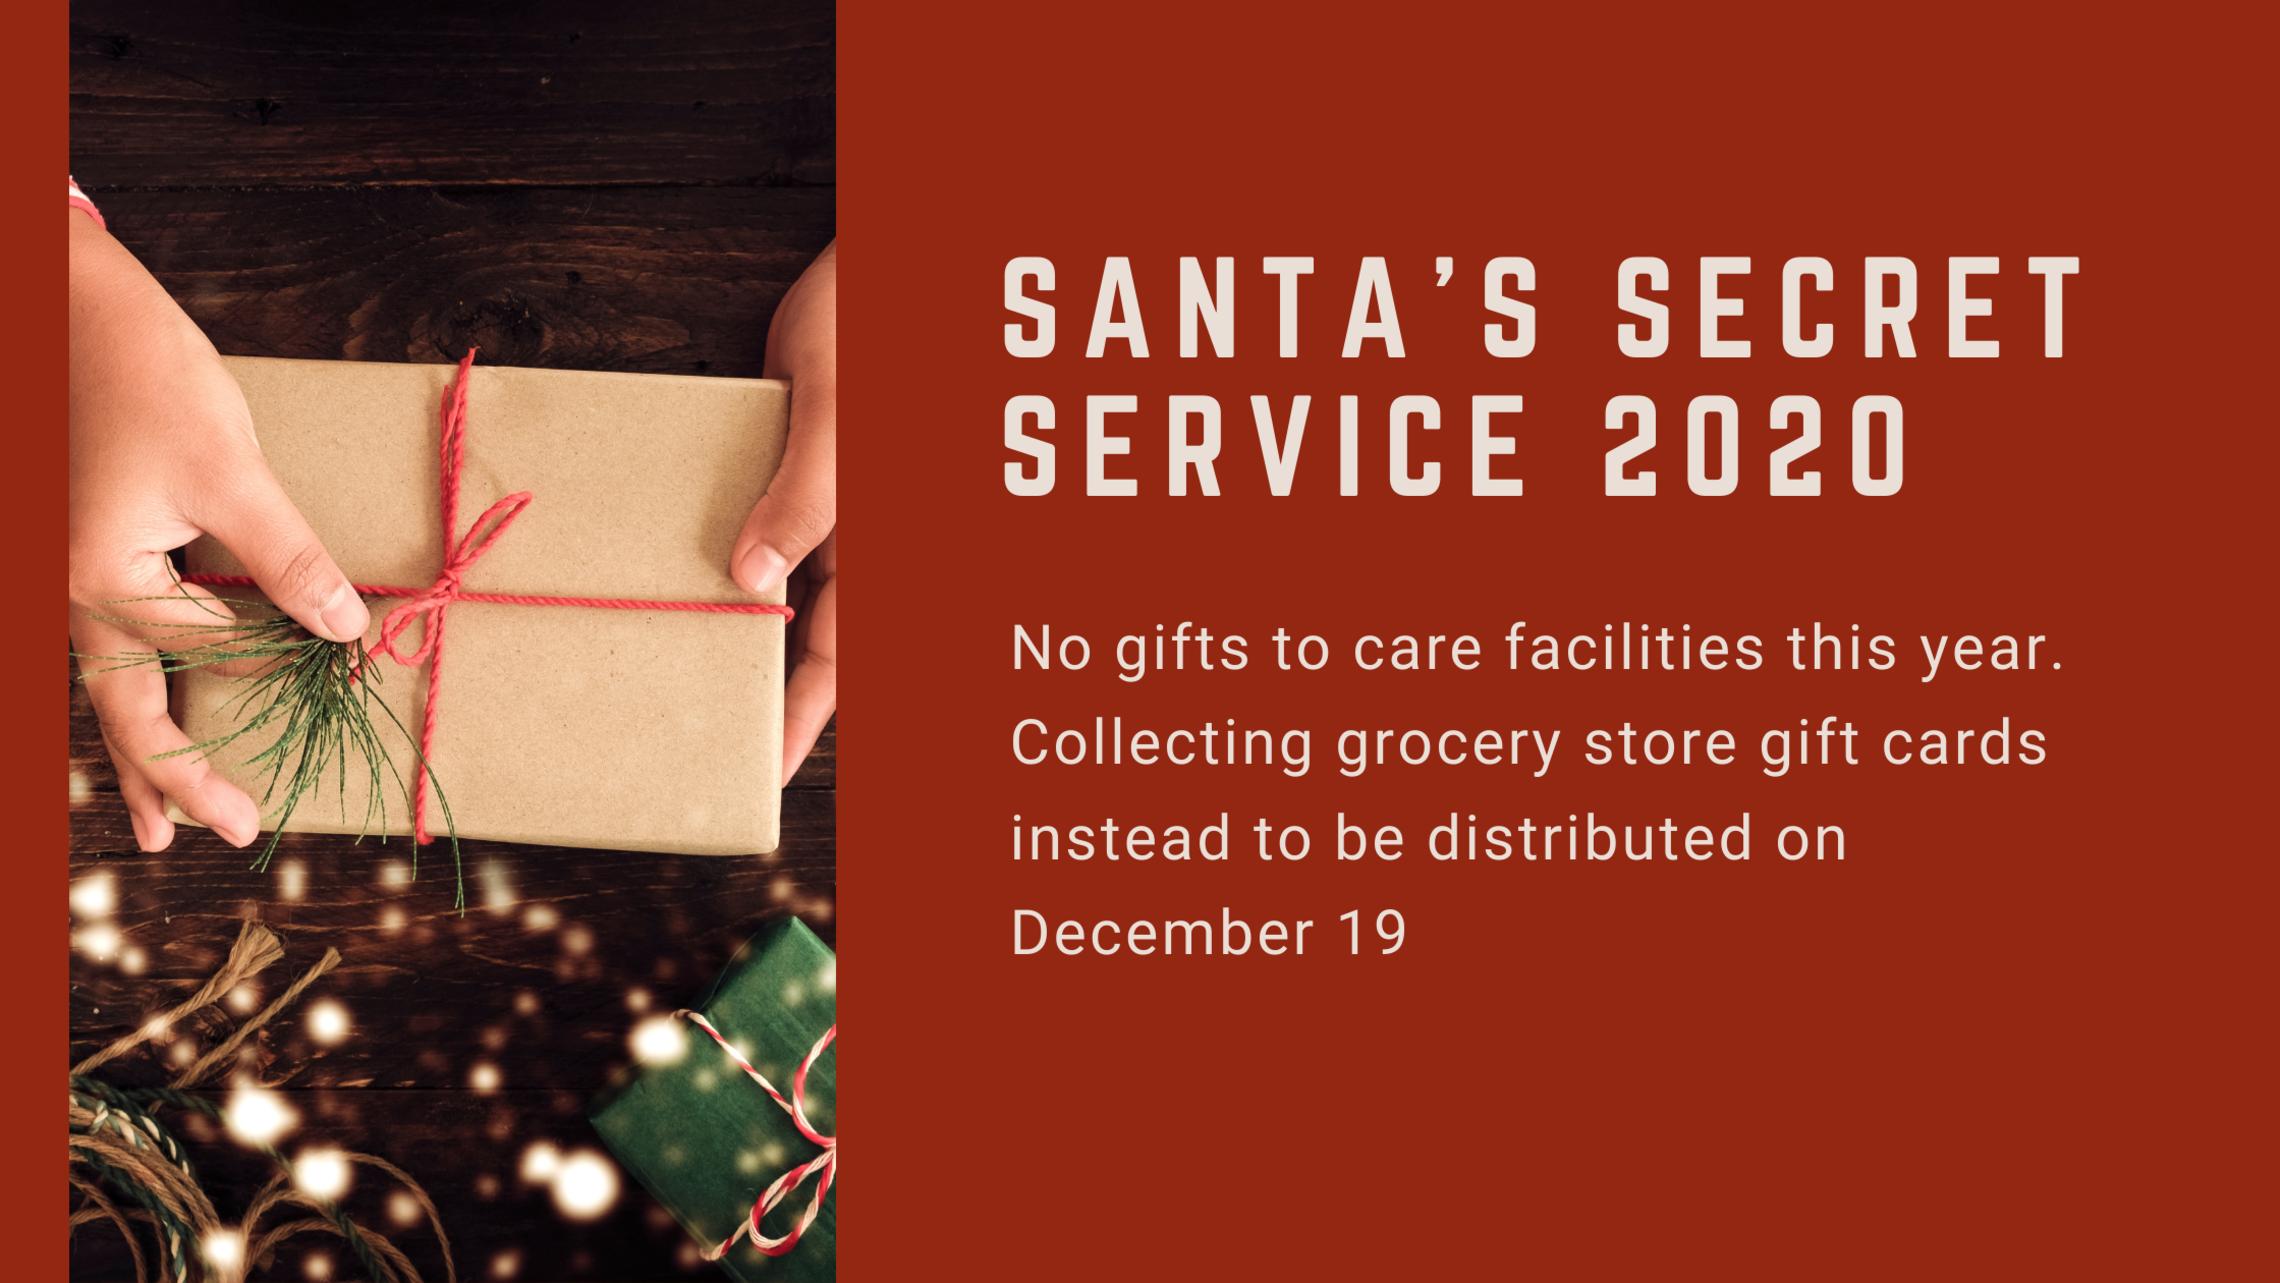 Santas Secret Service